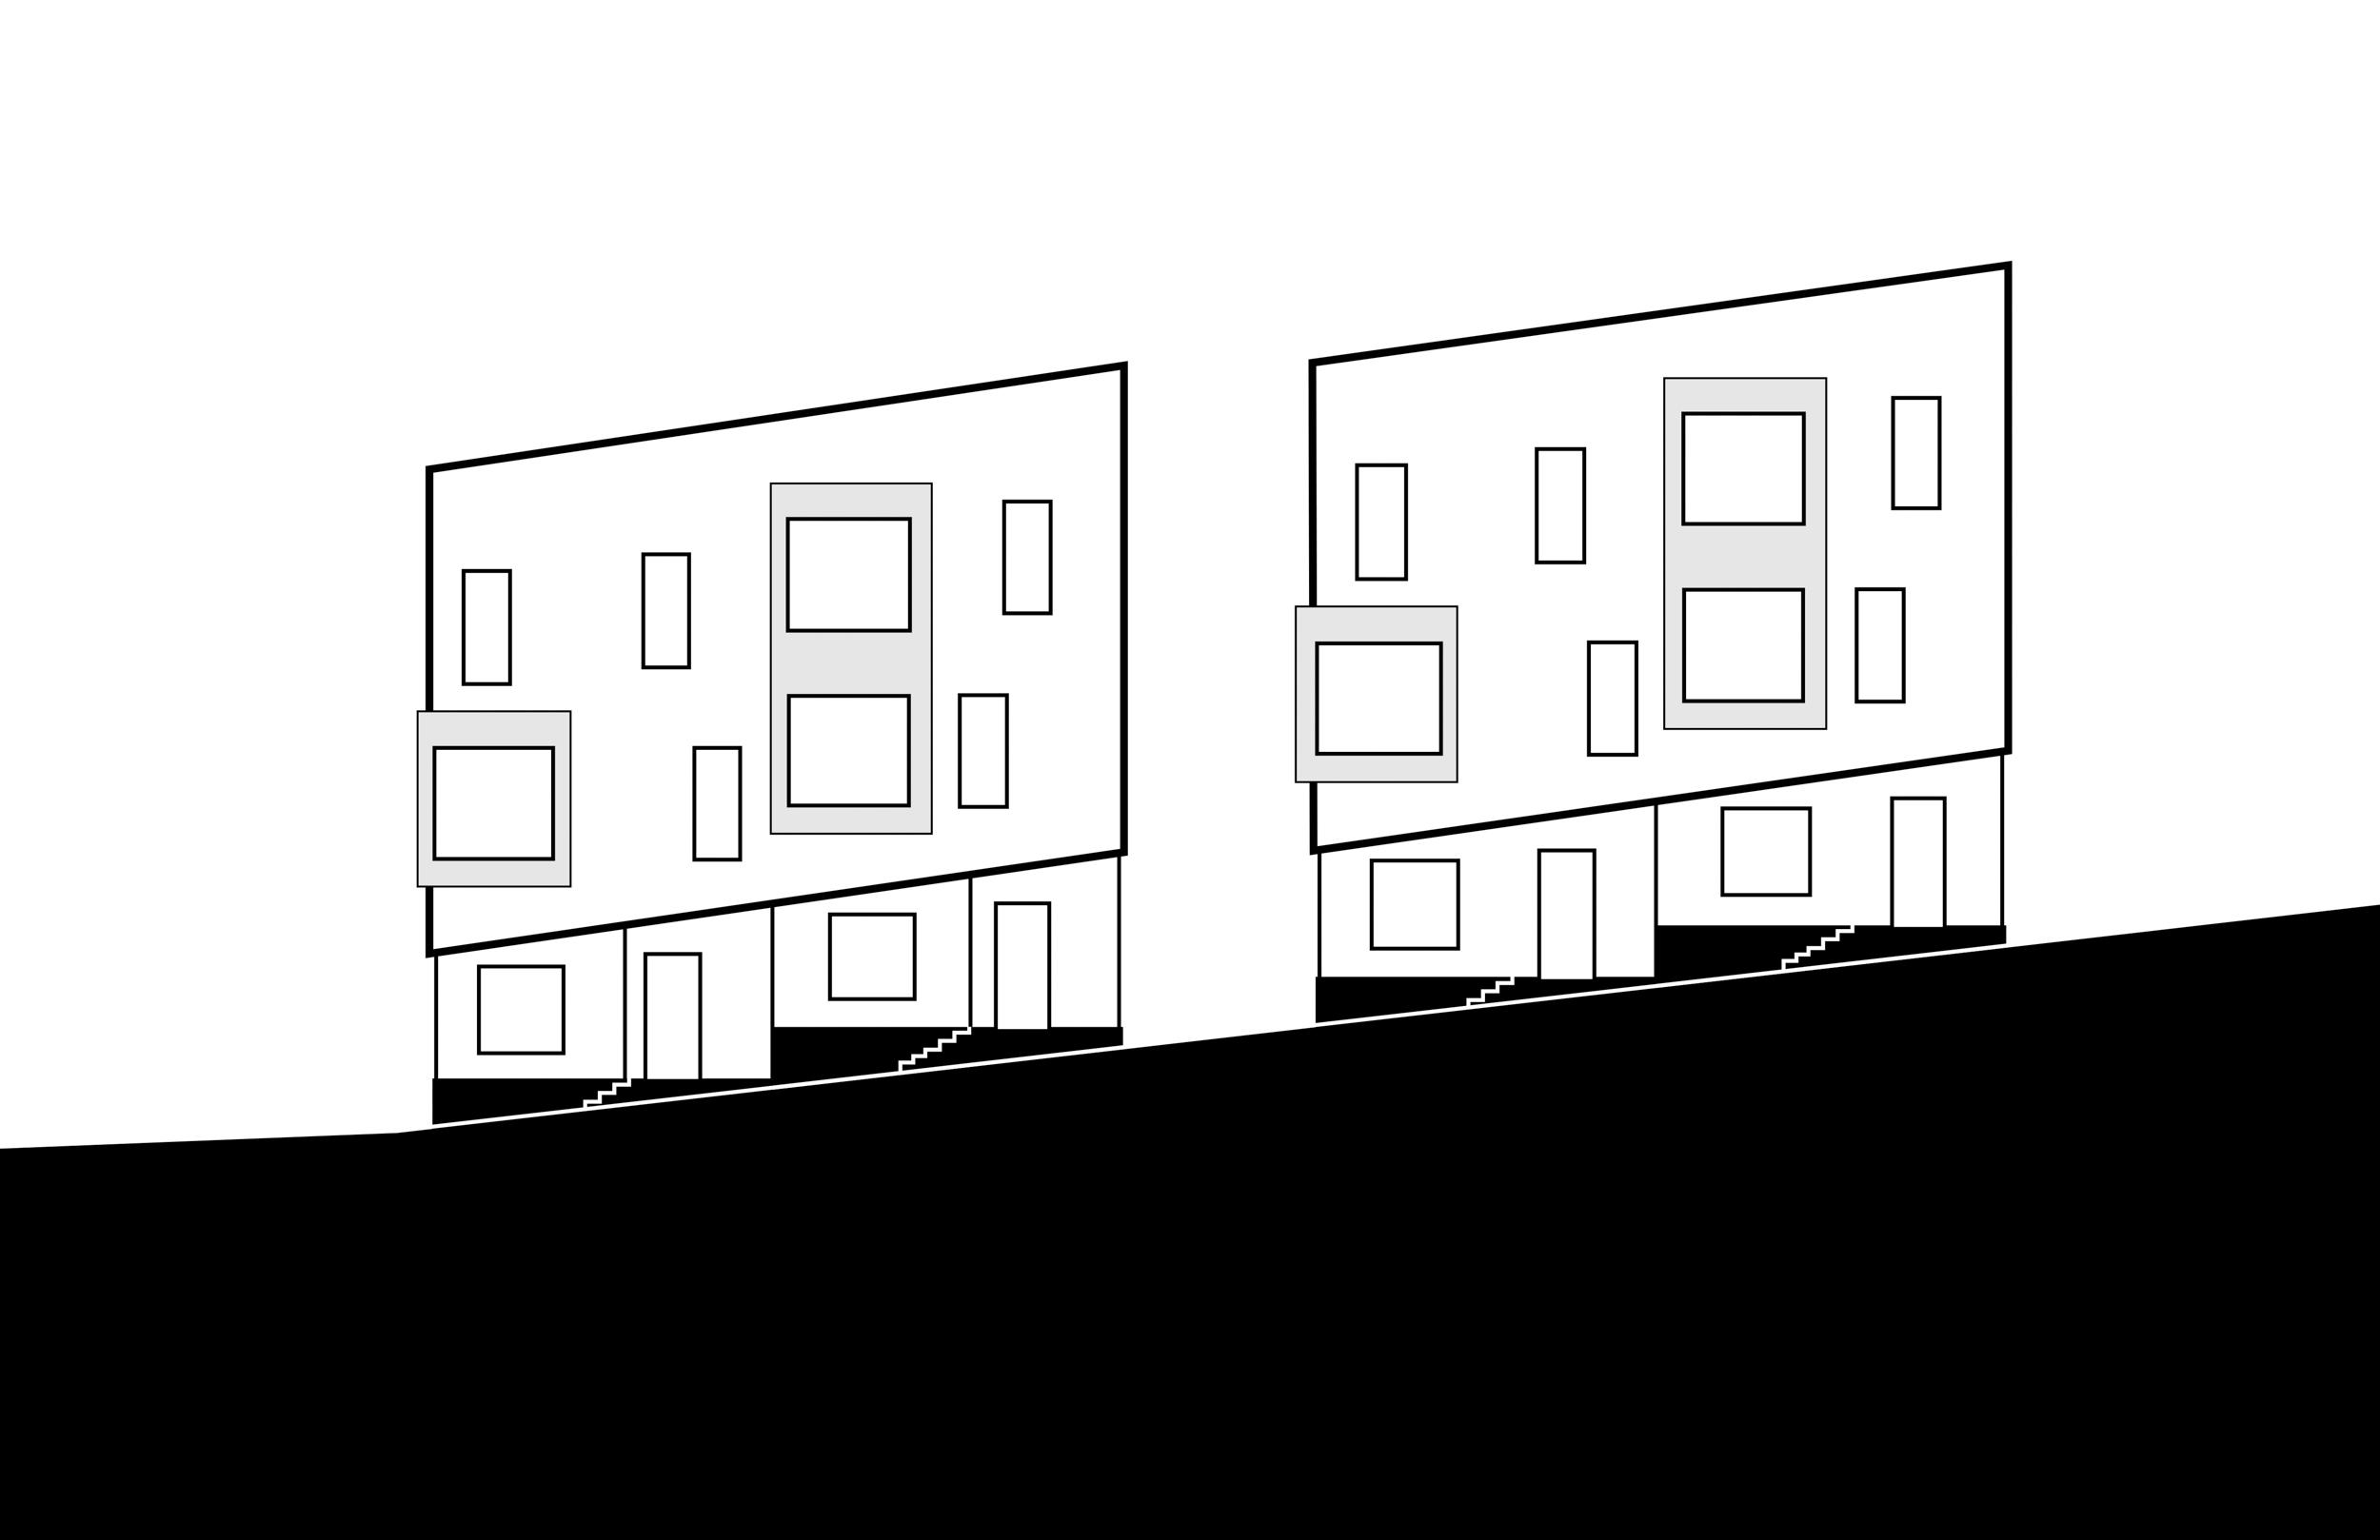 2302 G STREET - Diagram 6.jpg